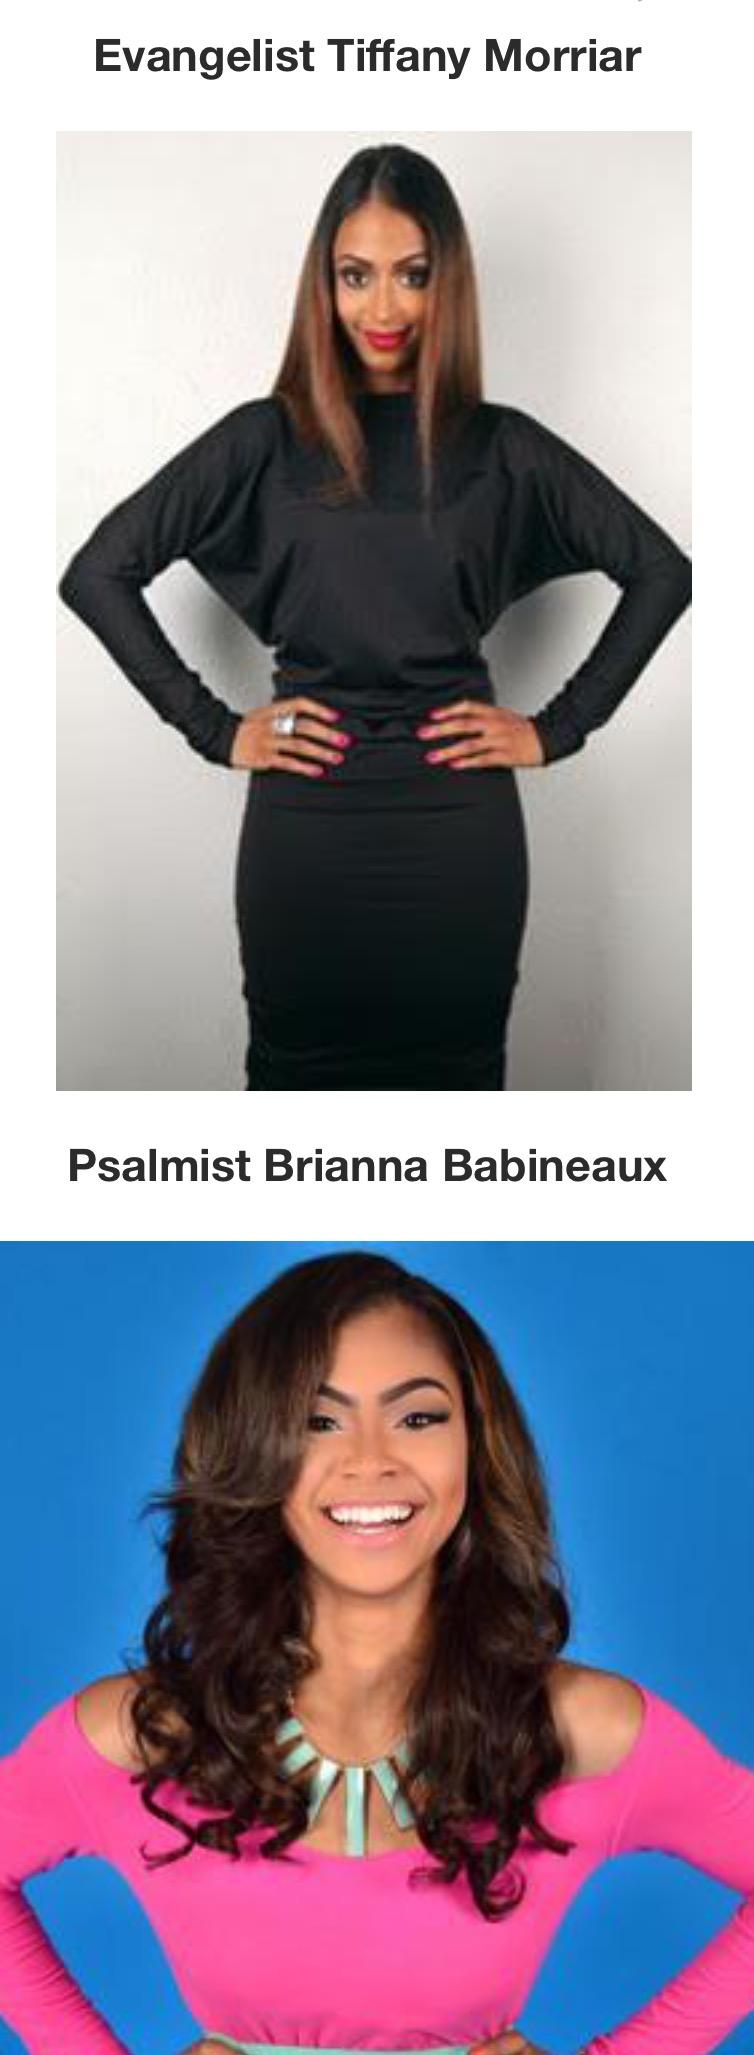 Evangelist Morriar and Psalmist Babineaux